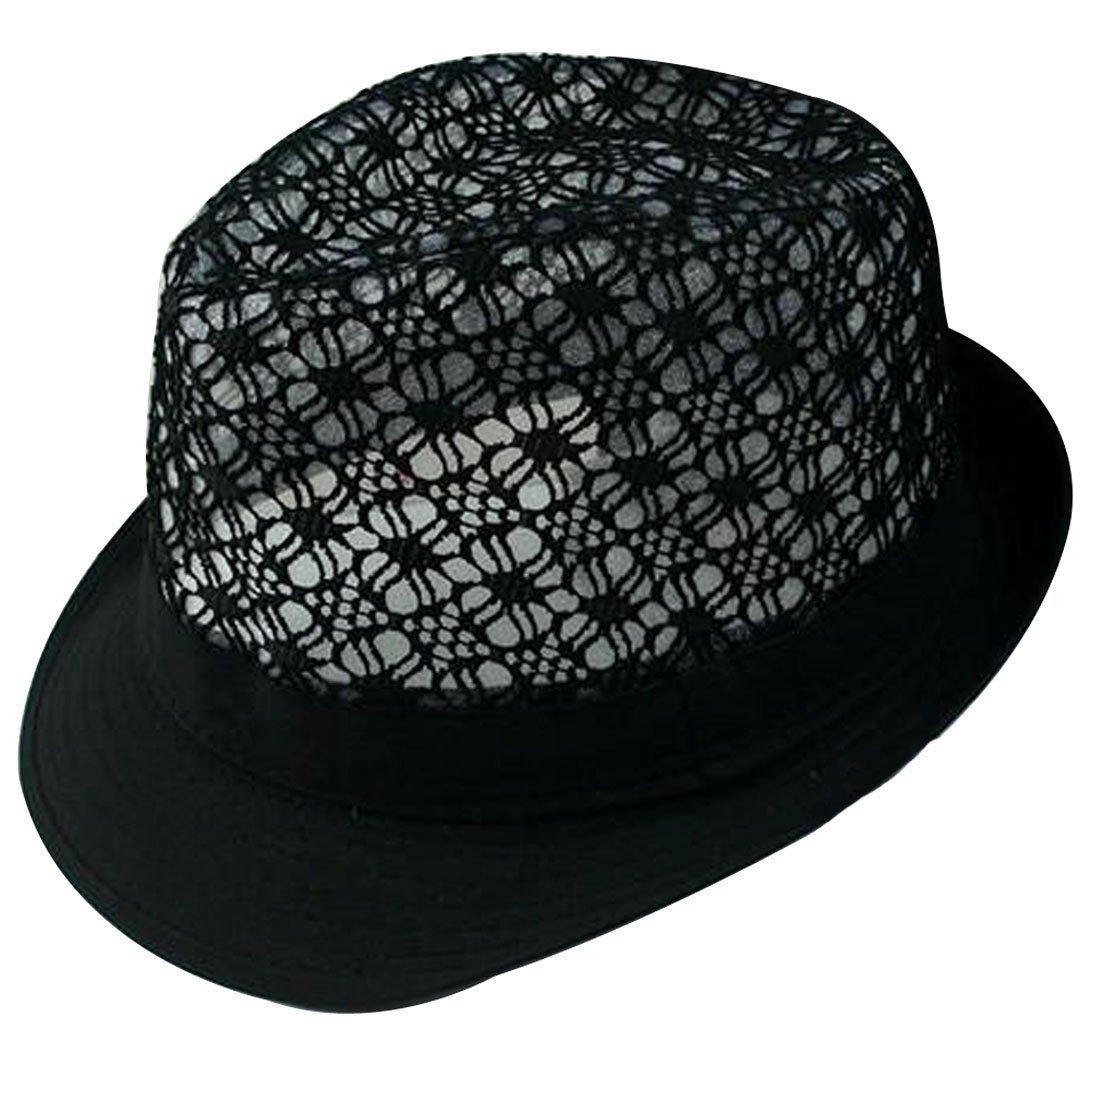 4995e2a014d Lerben Women Summer Beach Colorful Brim Fedora Hat Sun Hats Black at Amazon  Women's Clothing store: